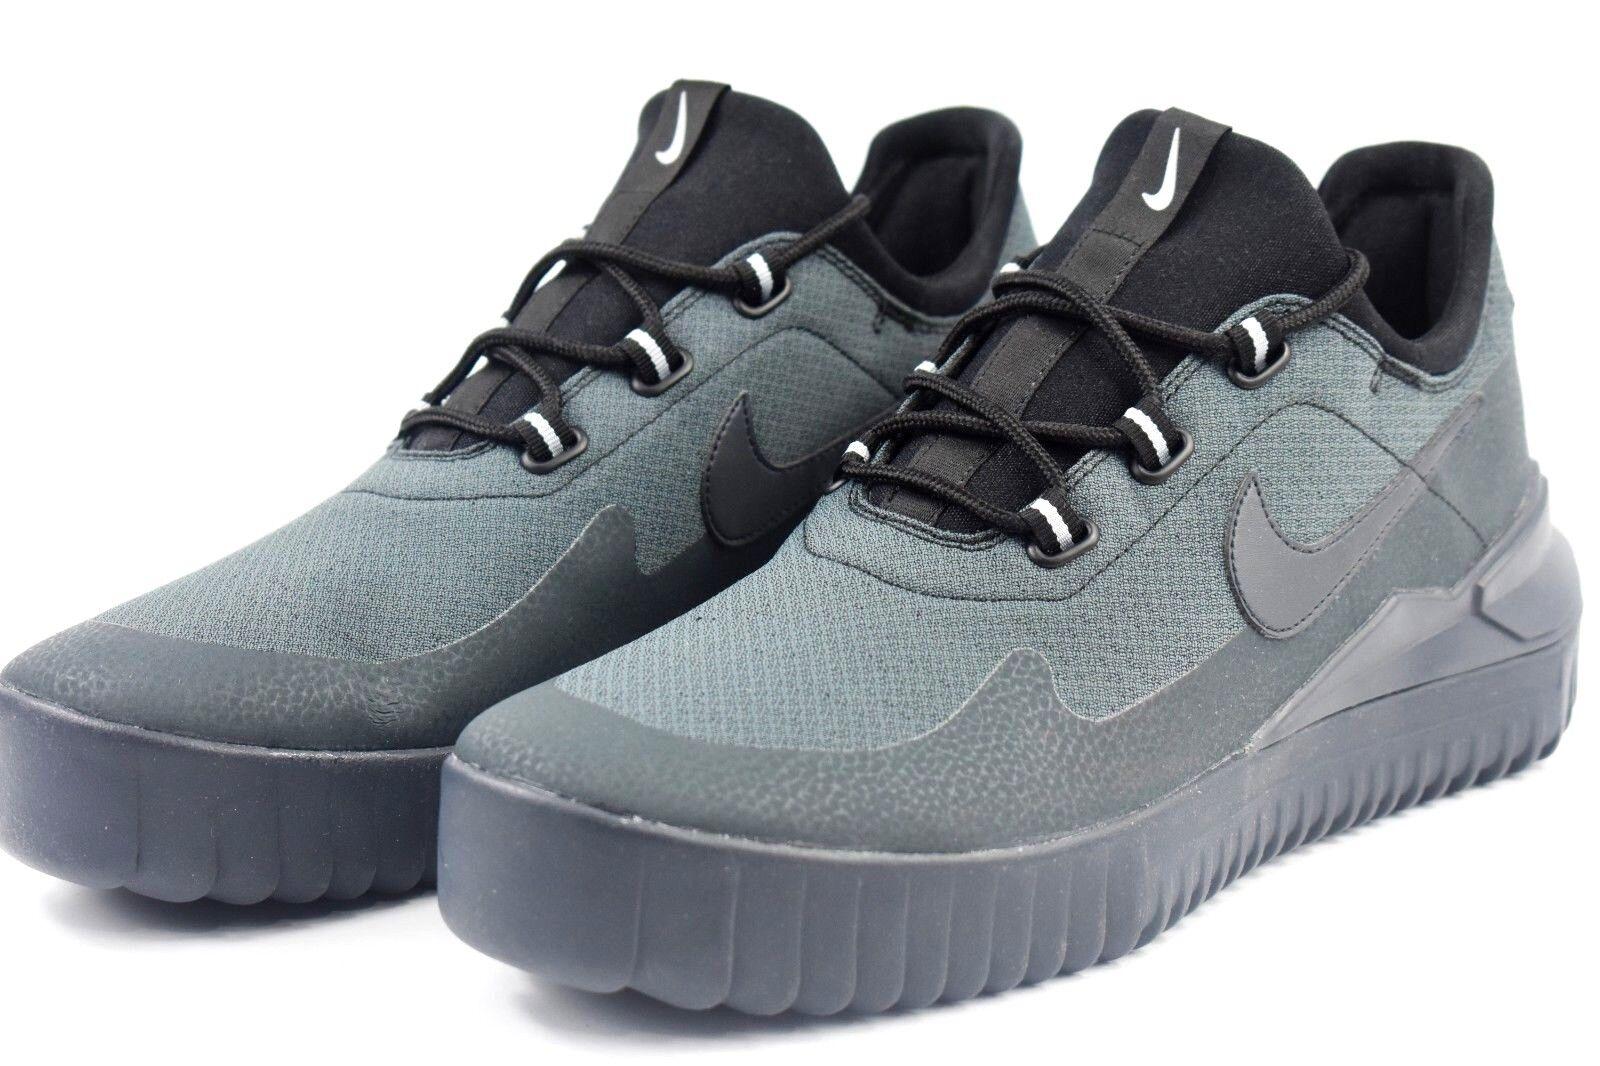 Nike Air Wild Mens Size 11.5 Black Grey Trail Hiking Boots 917547 002